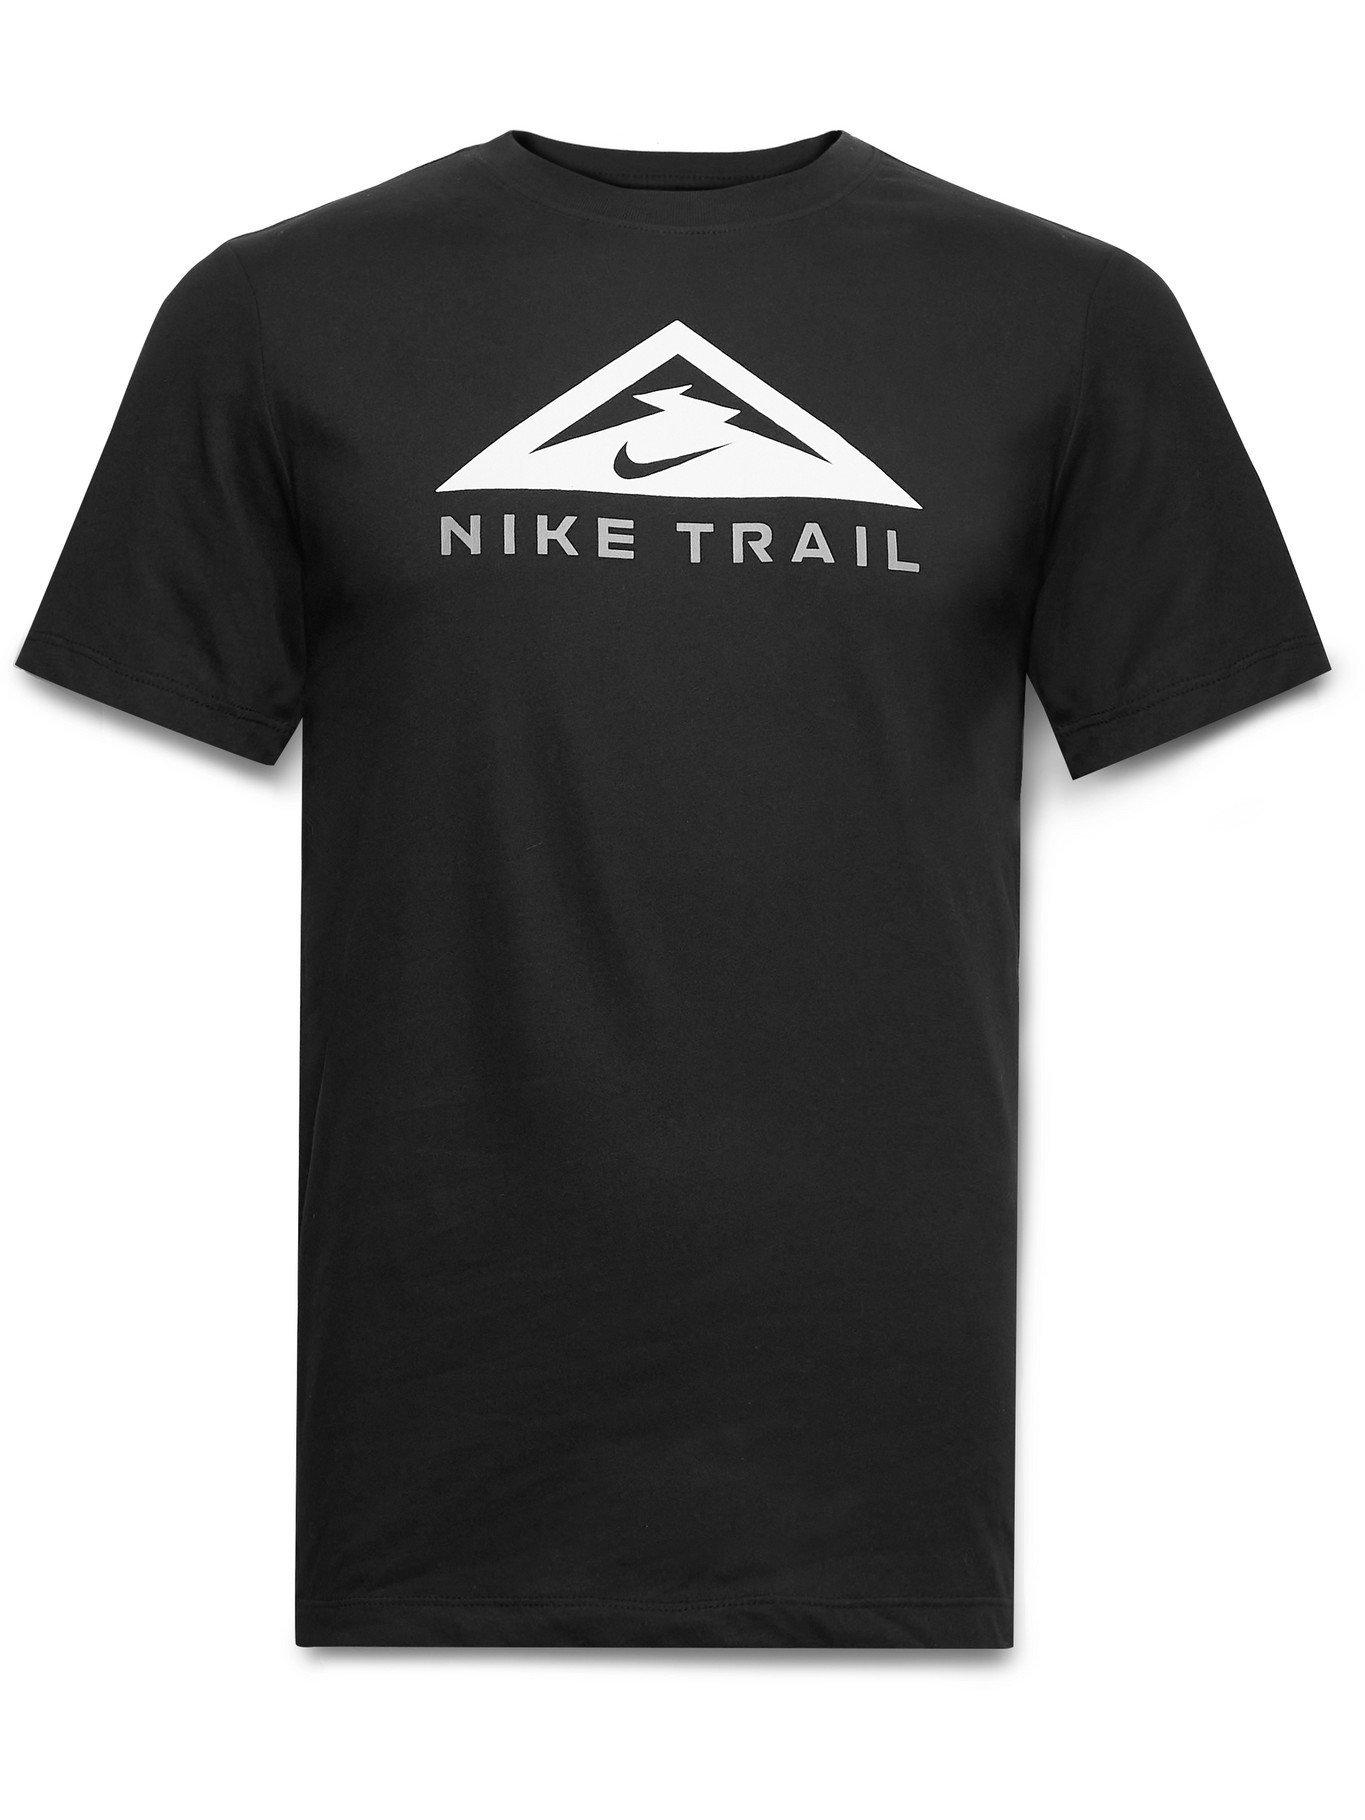 NIKE RUNNING - Trail Logo-Print Dri-FIT Cotton-Blend Jersey T-Shirt - Black - M